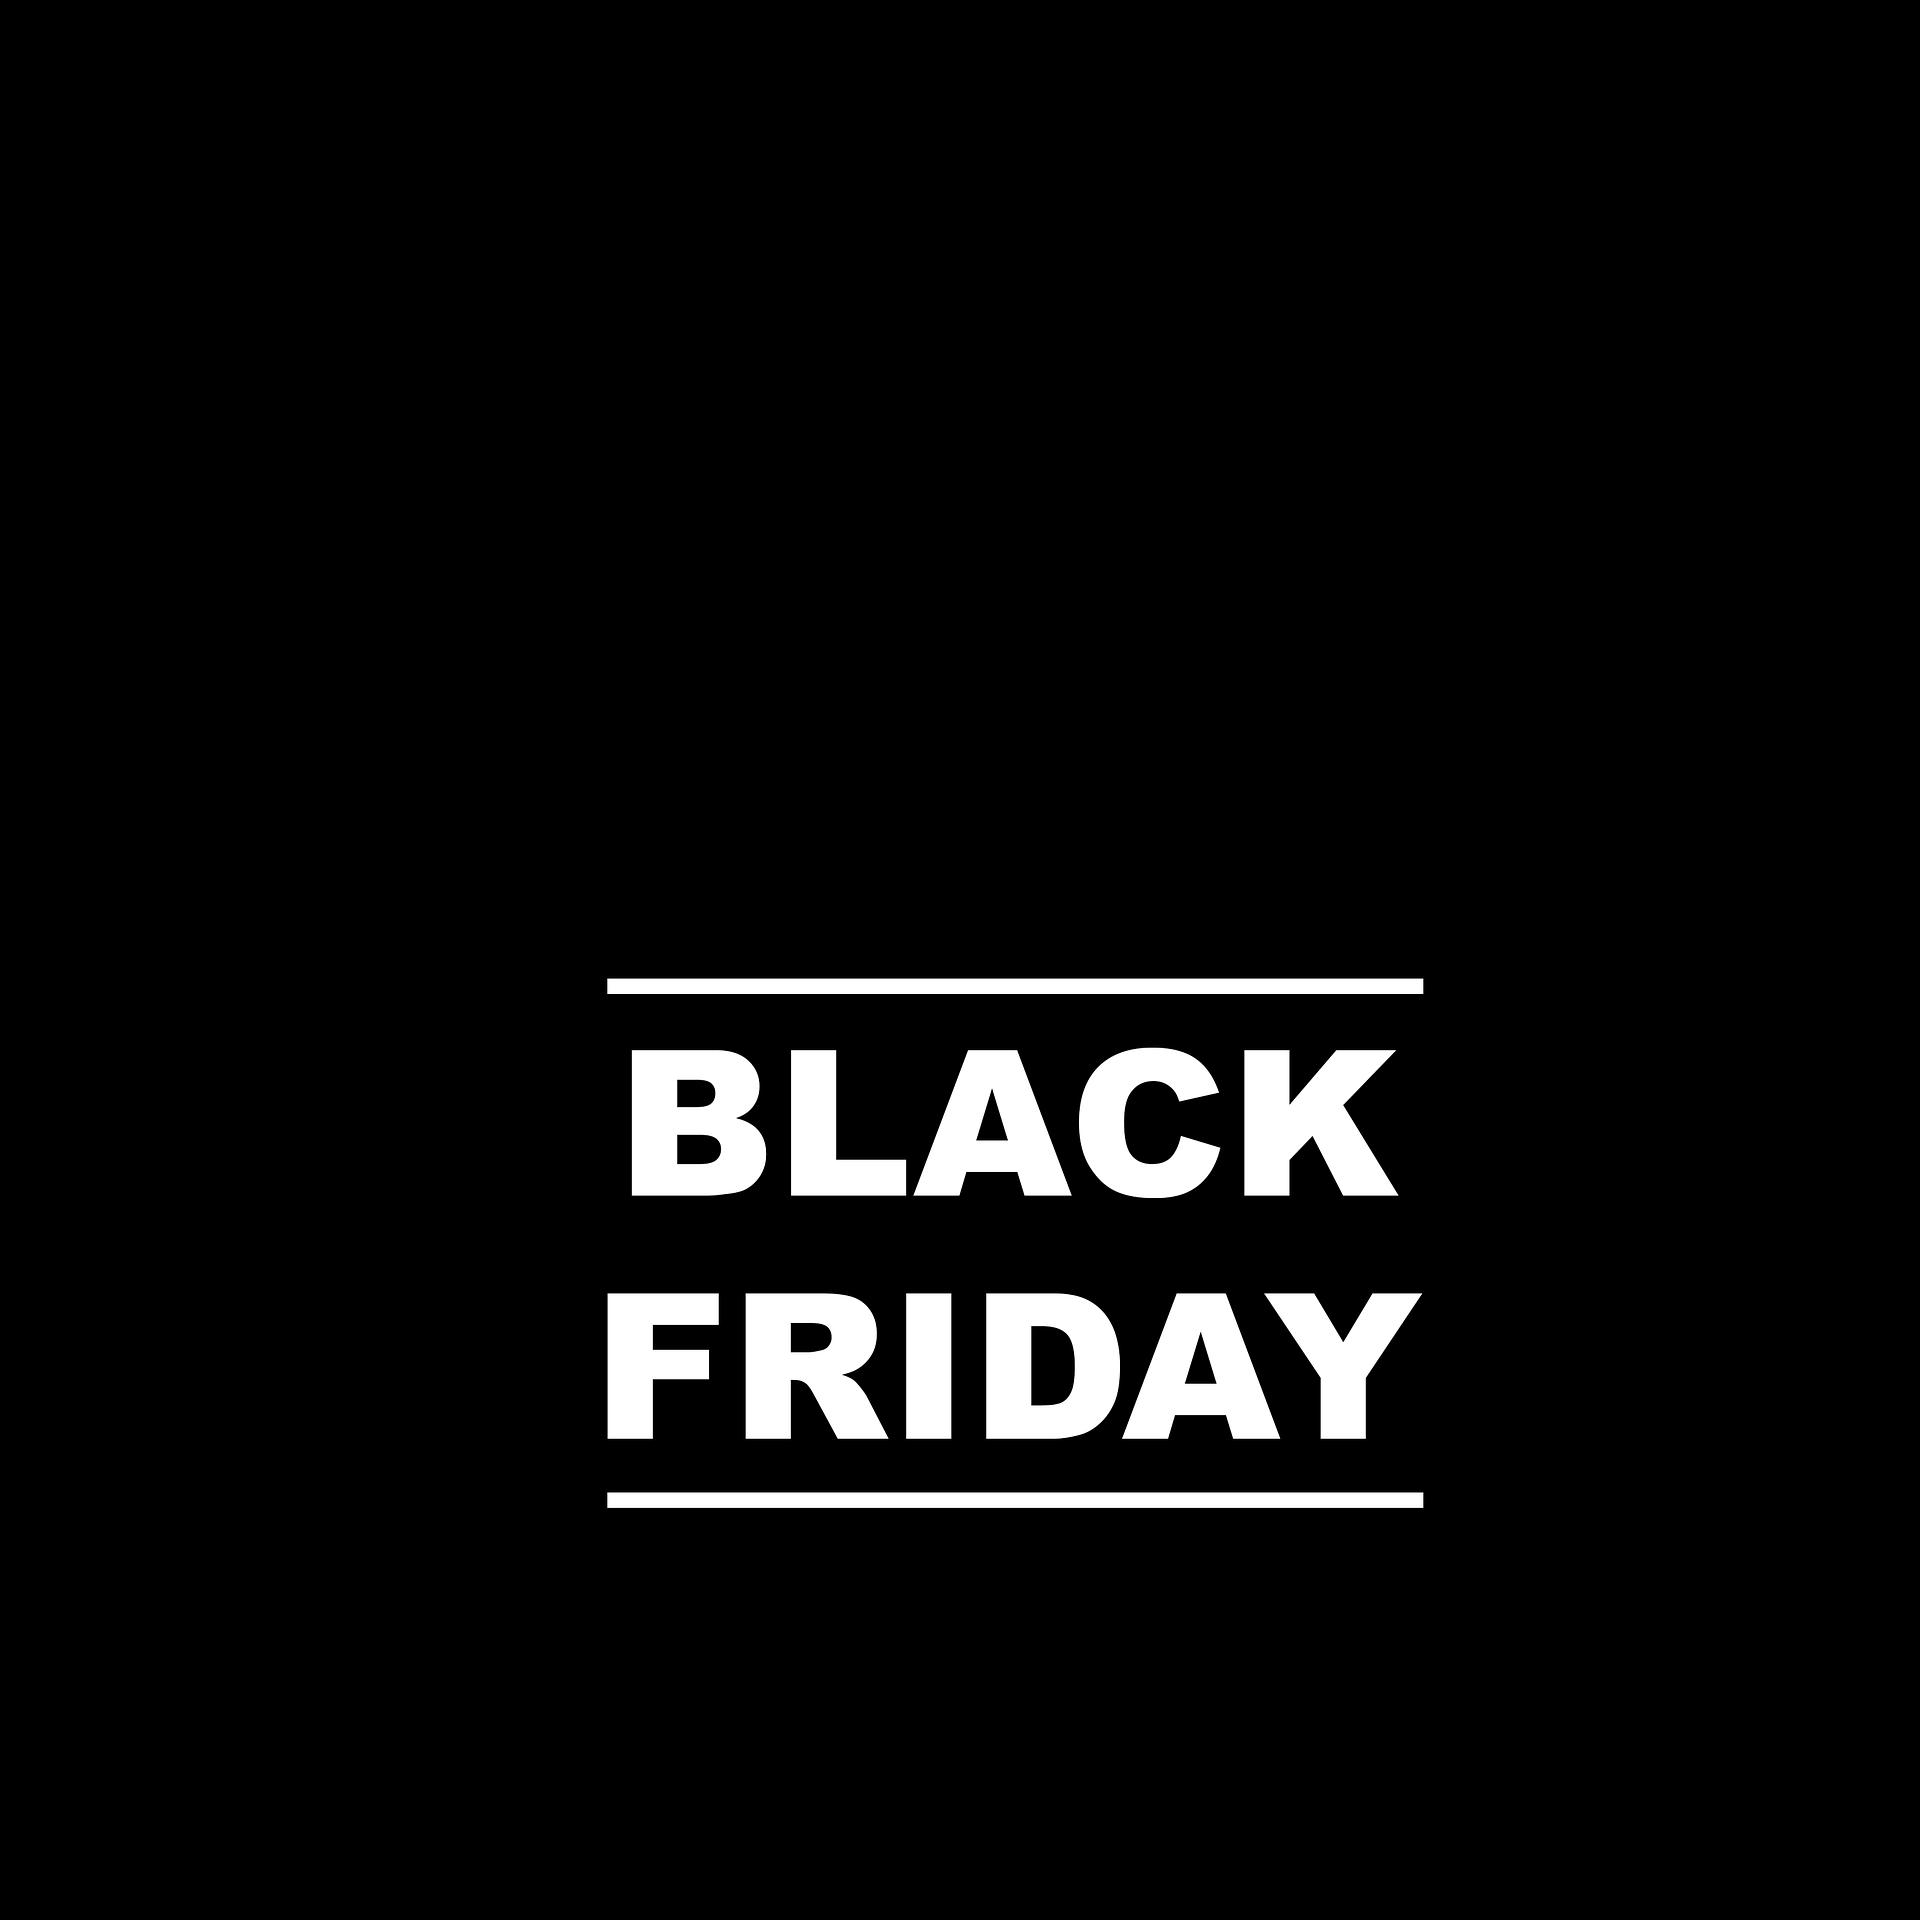 black-friday-4571831_1920 (1).png